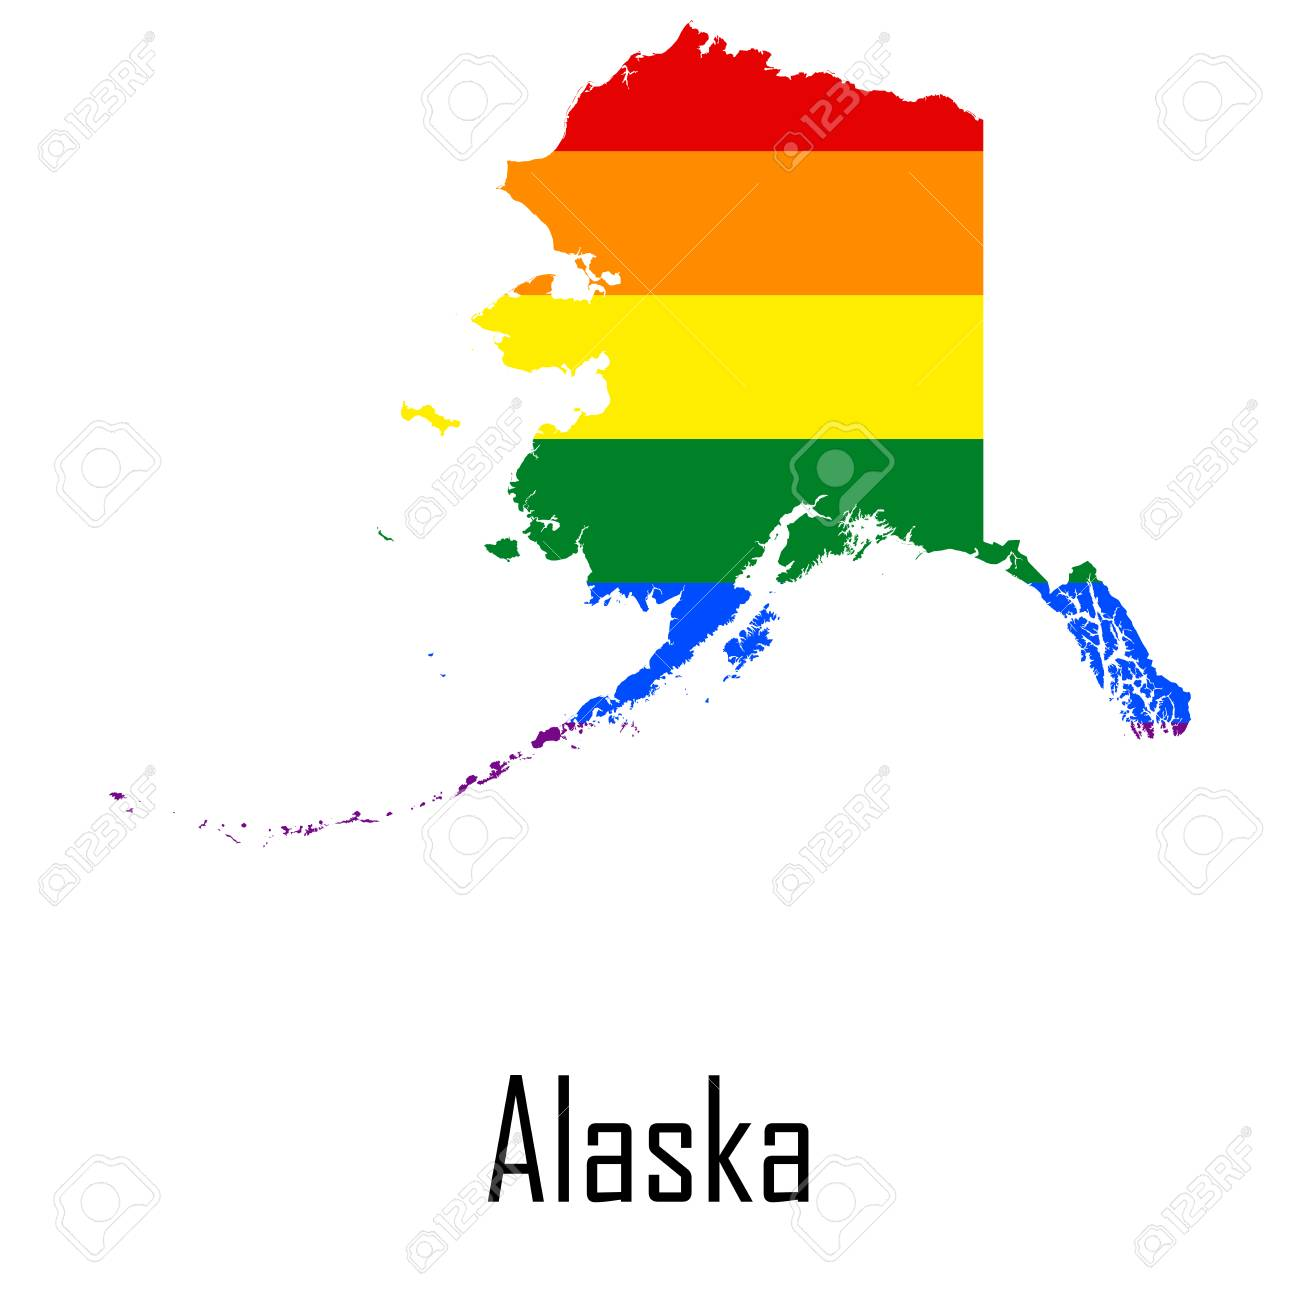 lesbische rainbow graphics